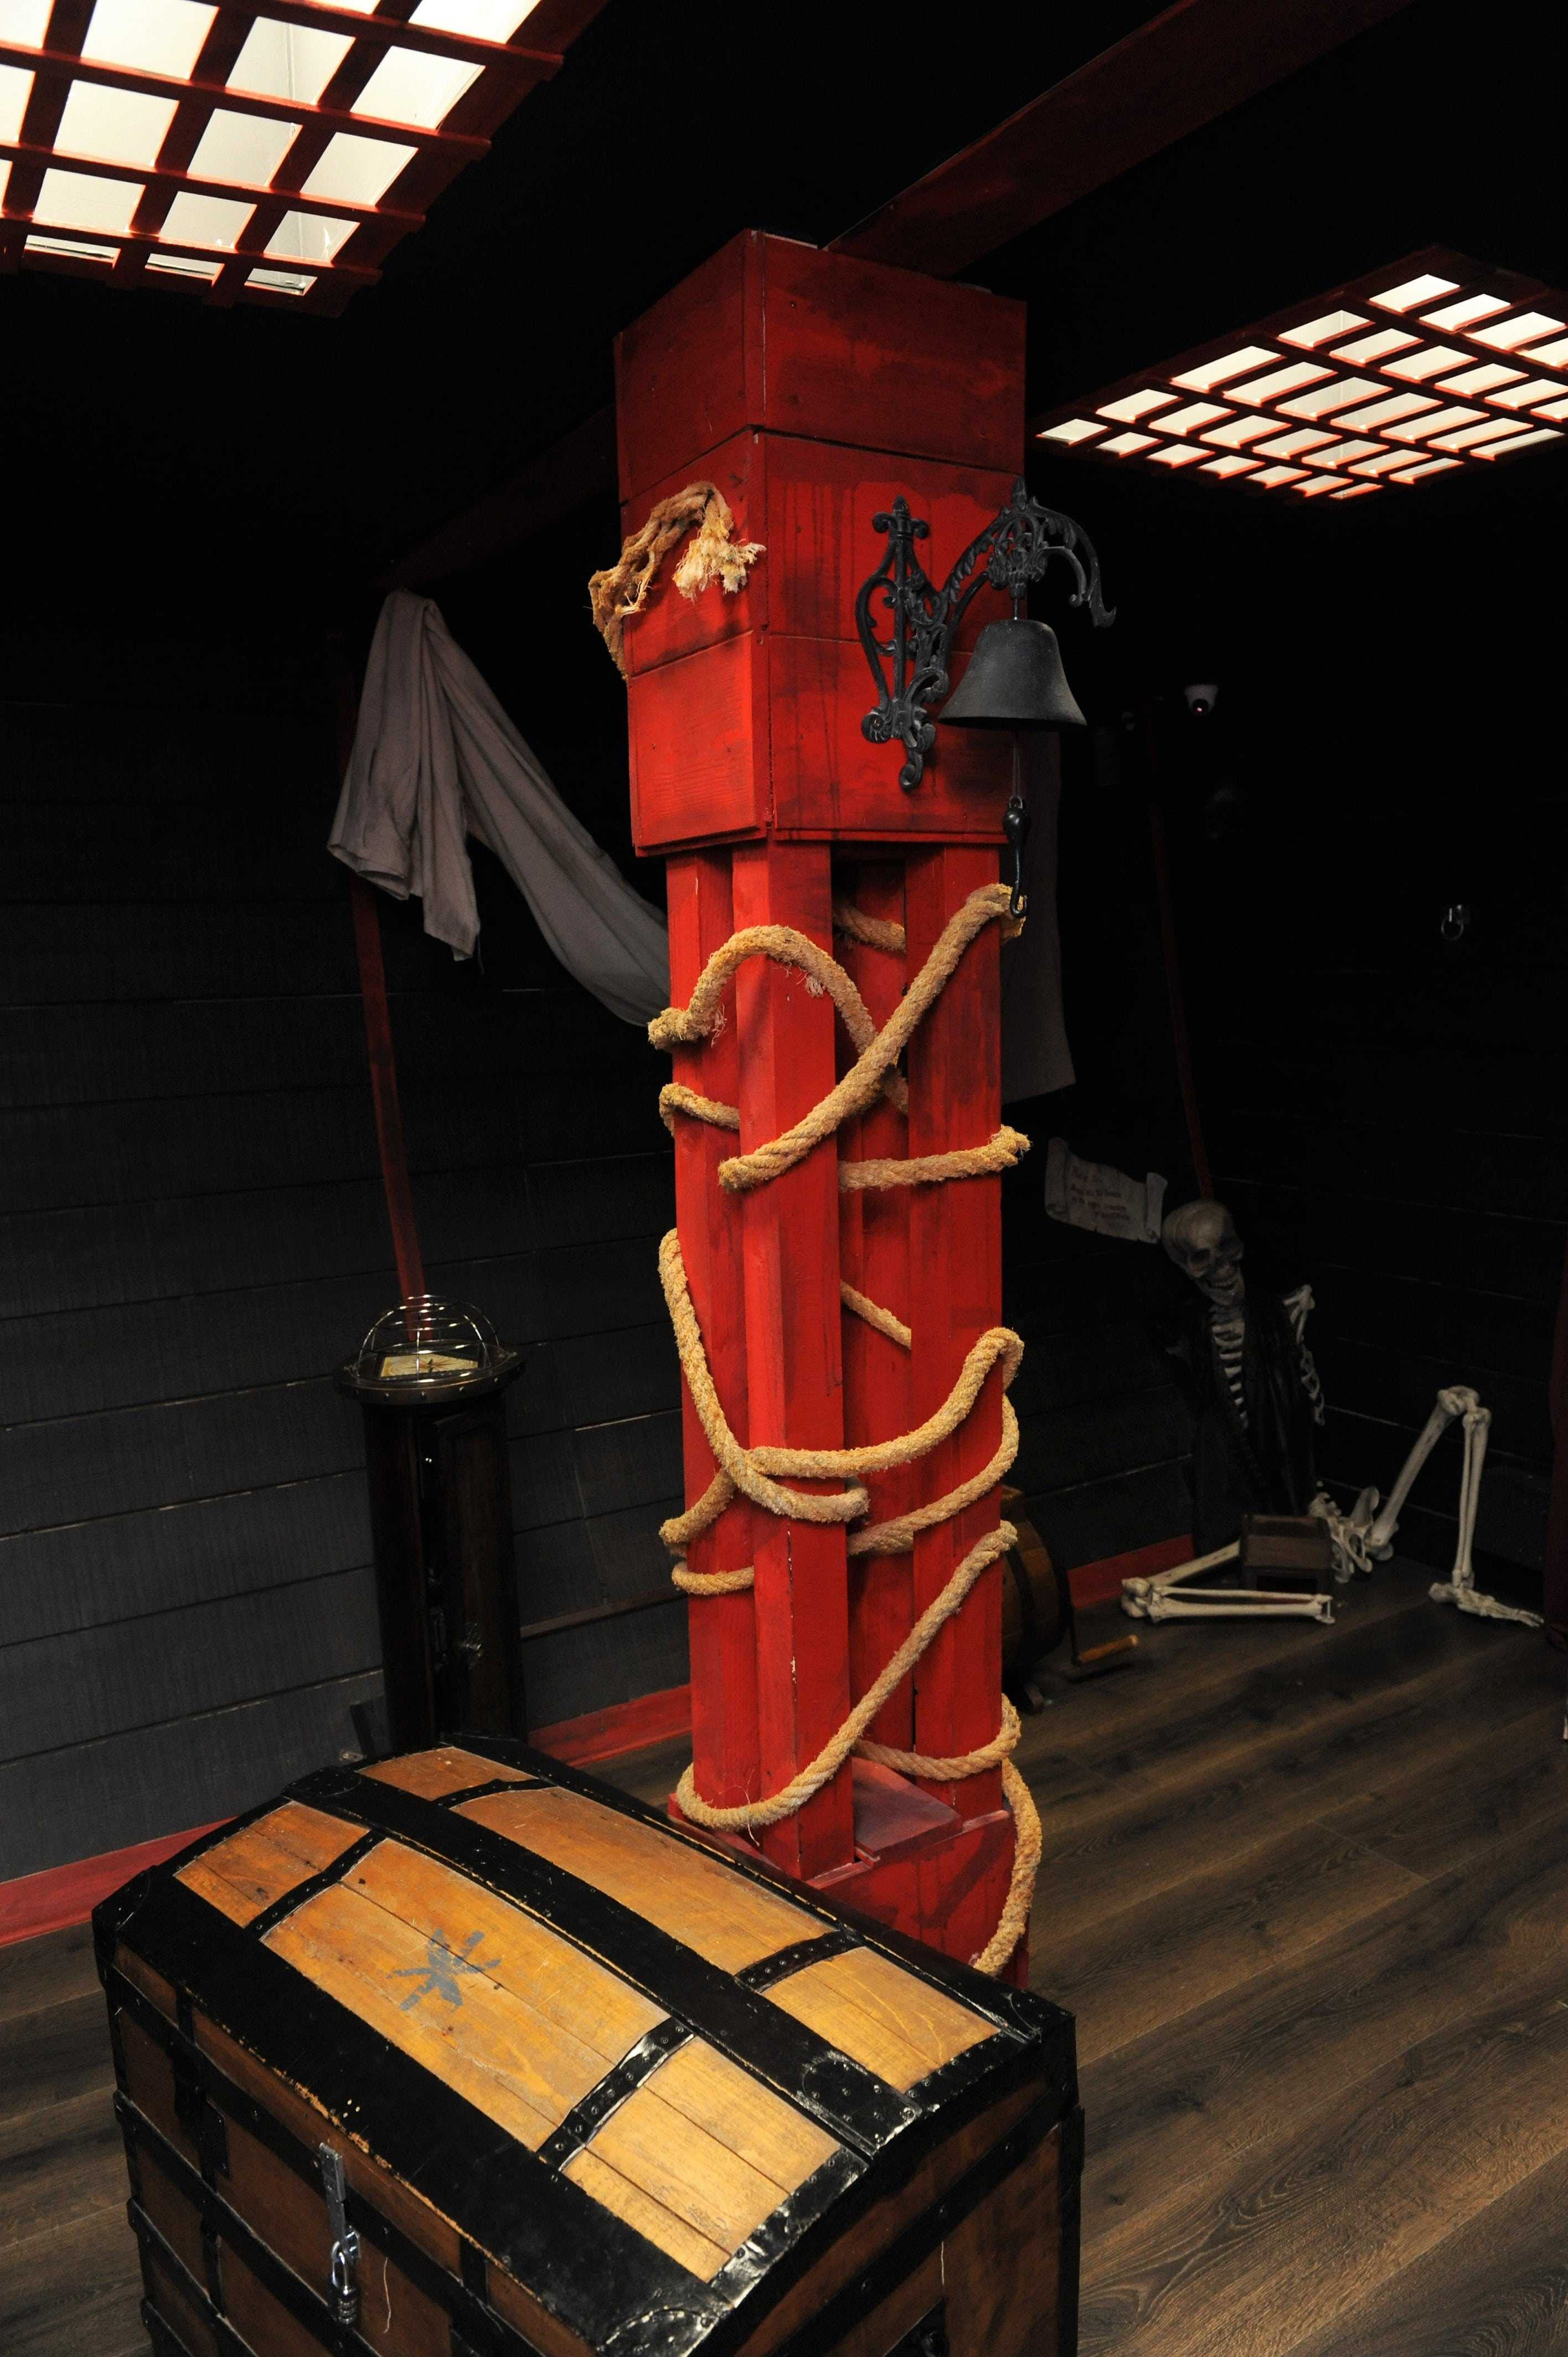 Salle Pirate